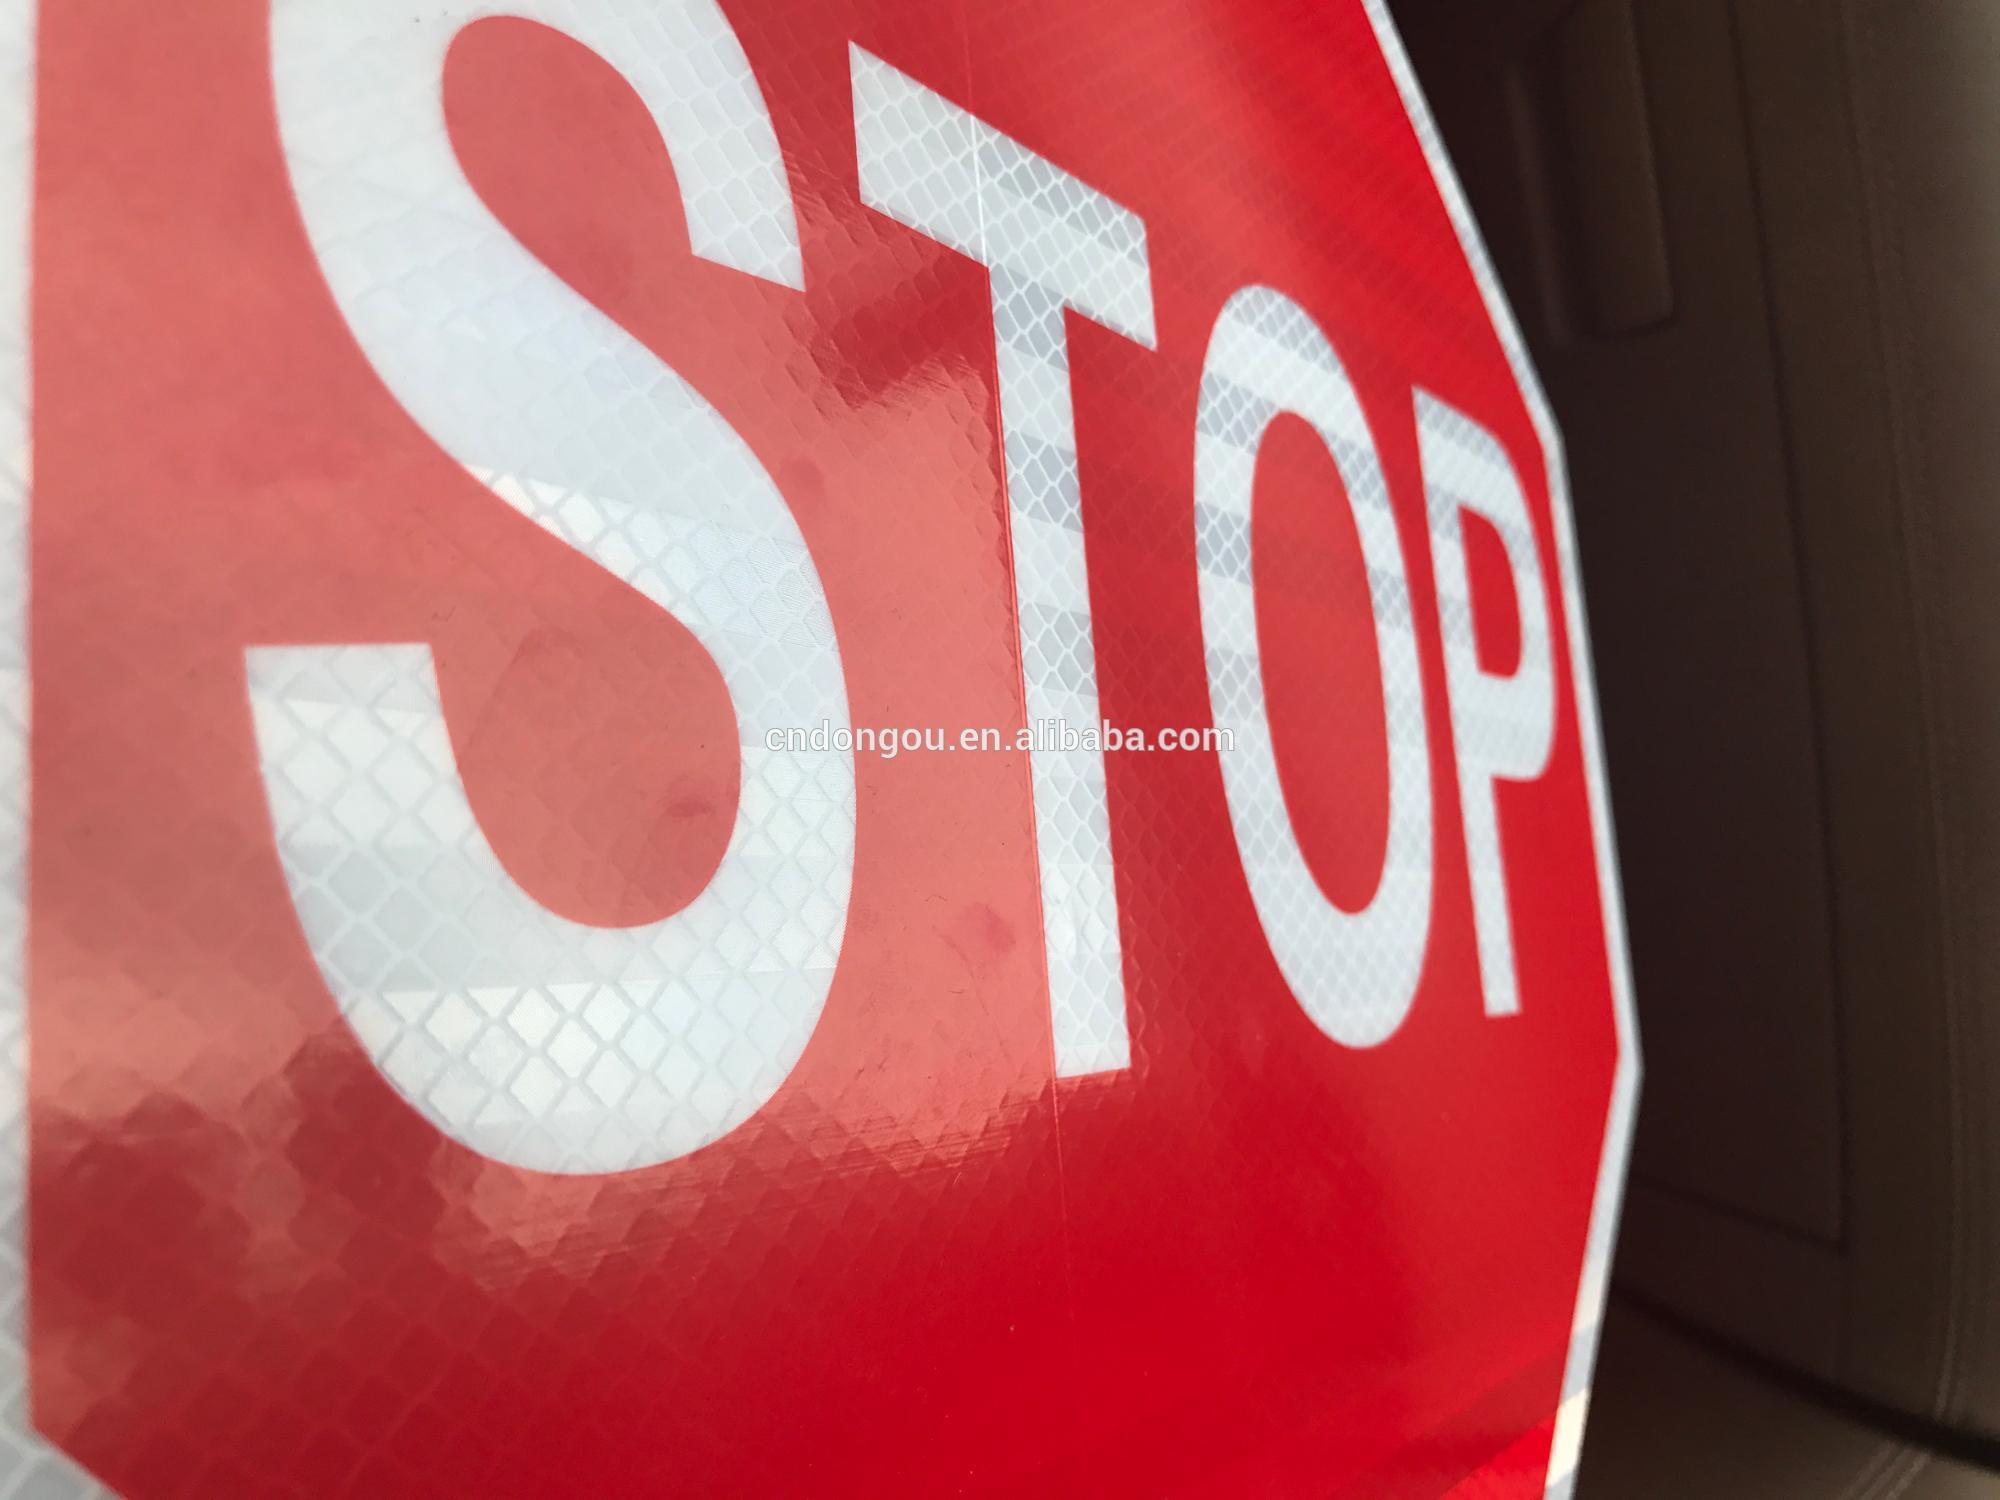 Reflective Aluminum Material Stop